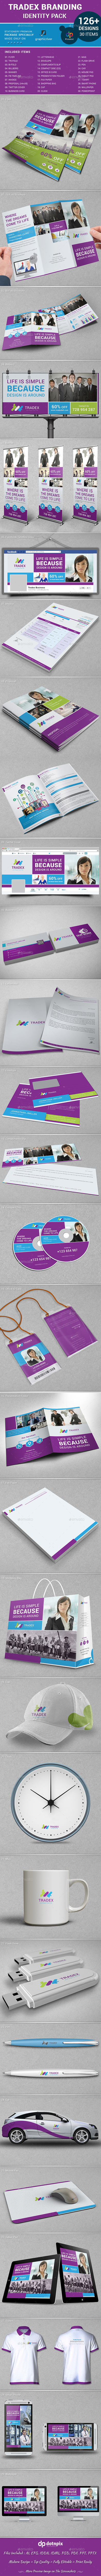 GraphicRiver Tradex Branding Identity Pack 10436250